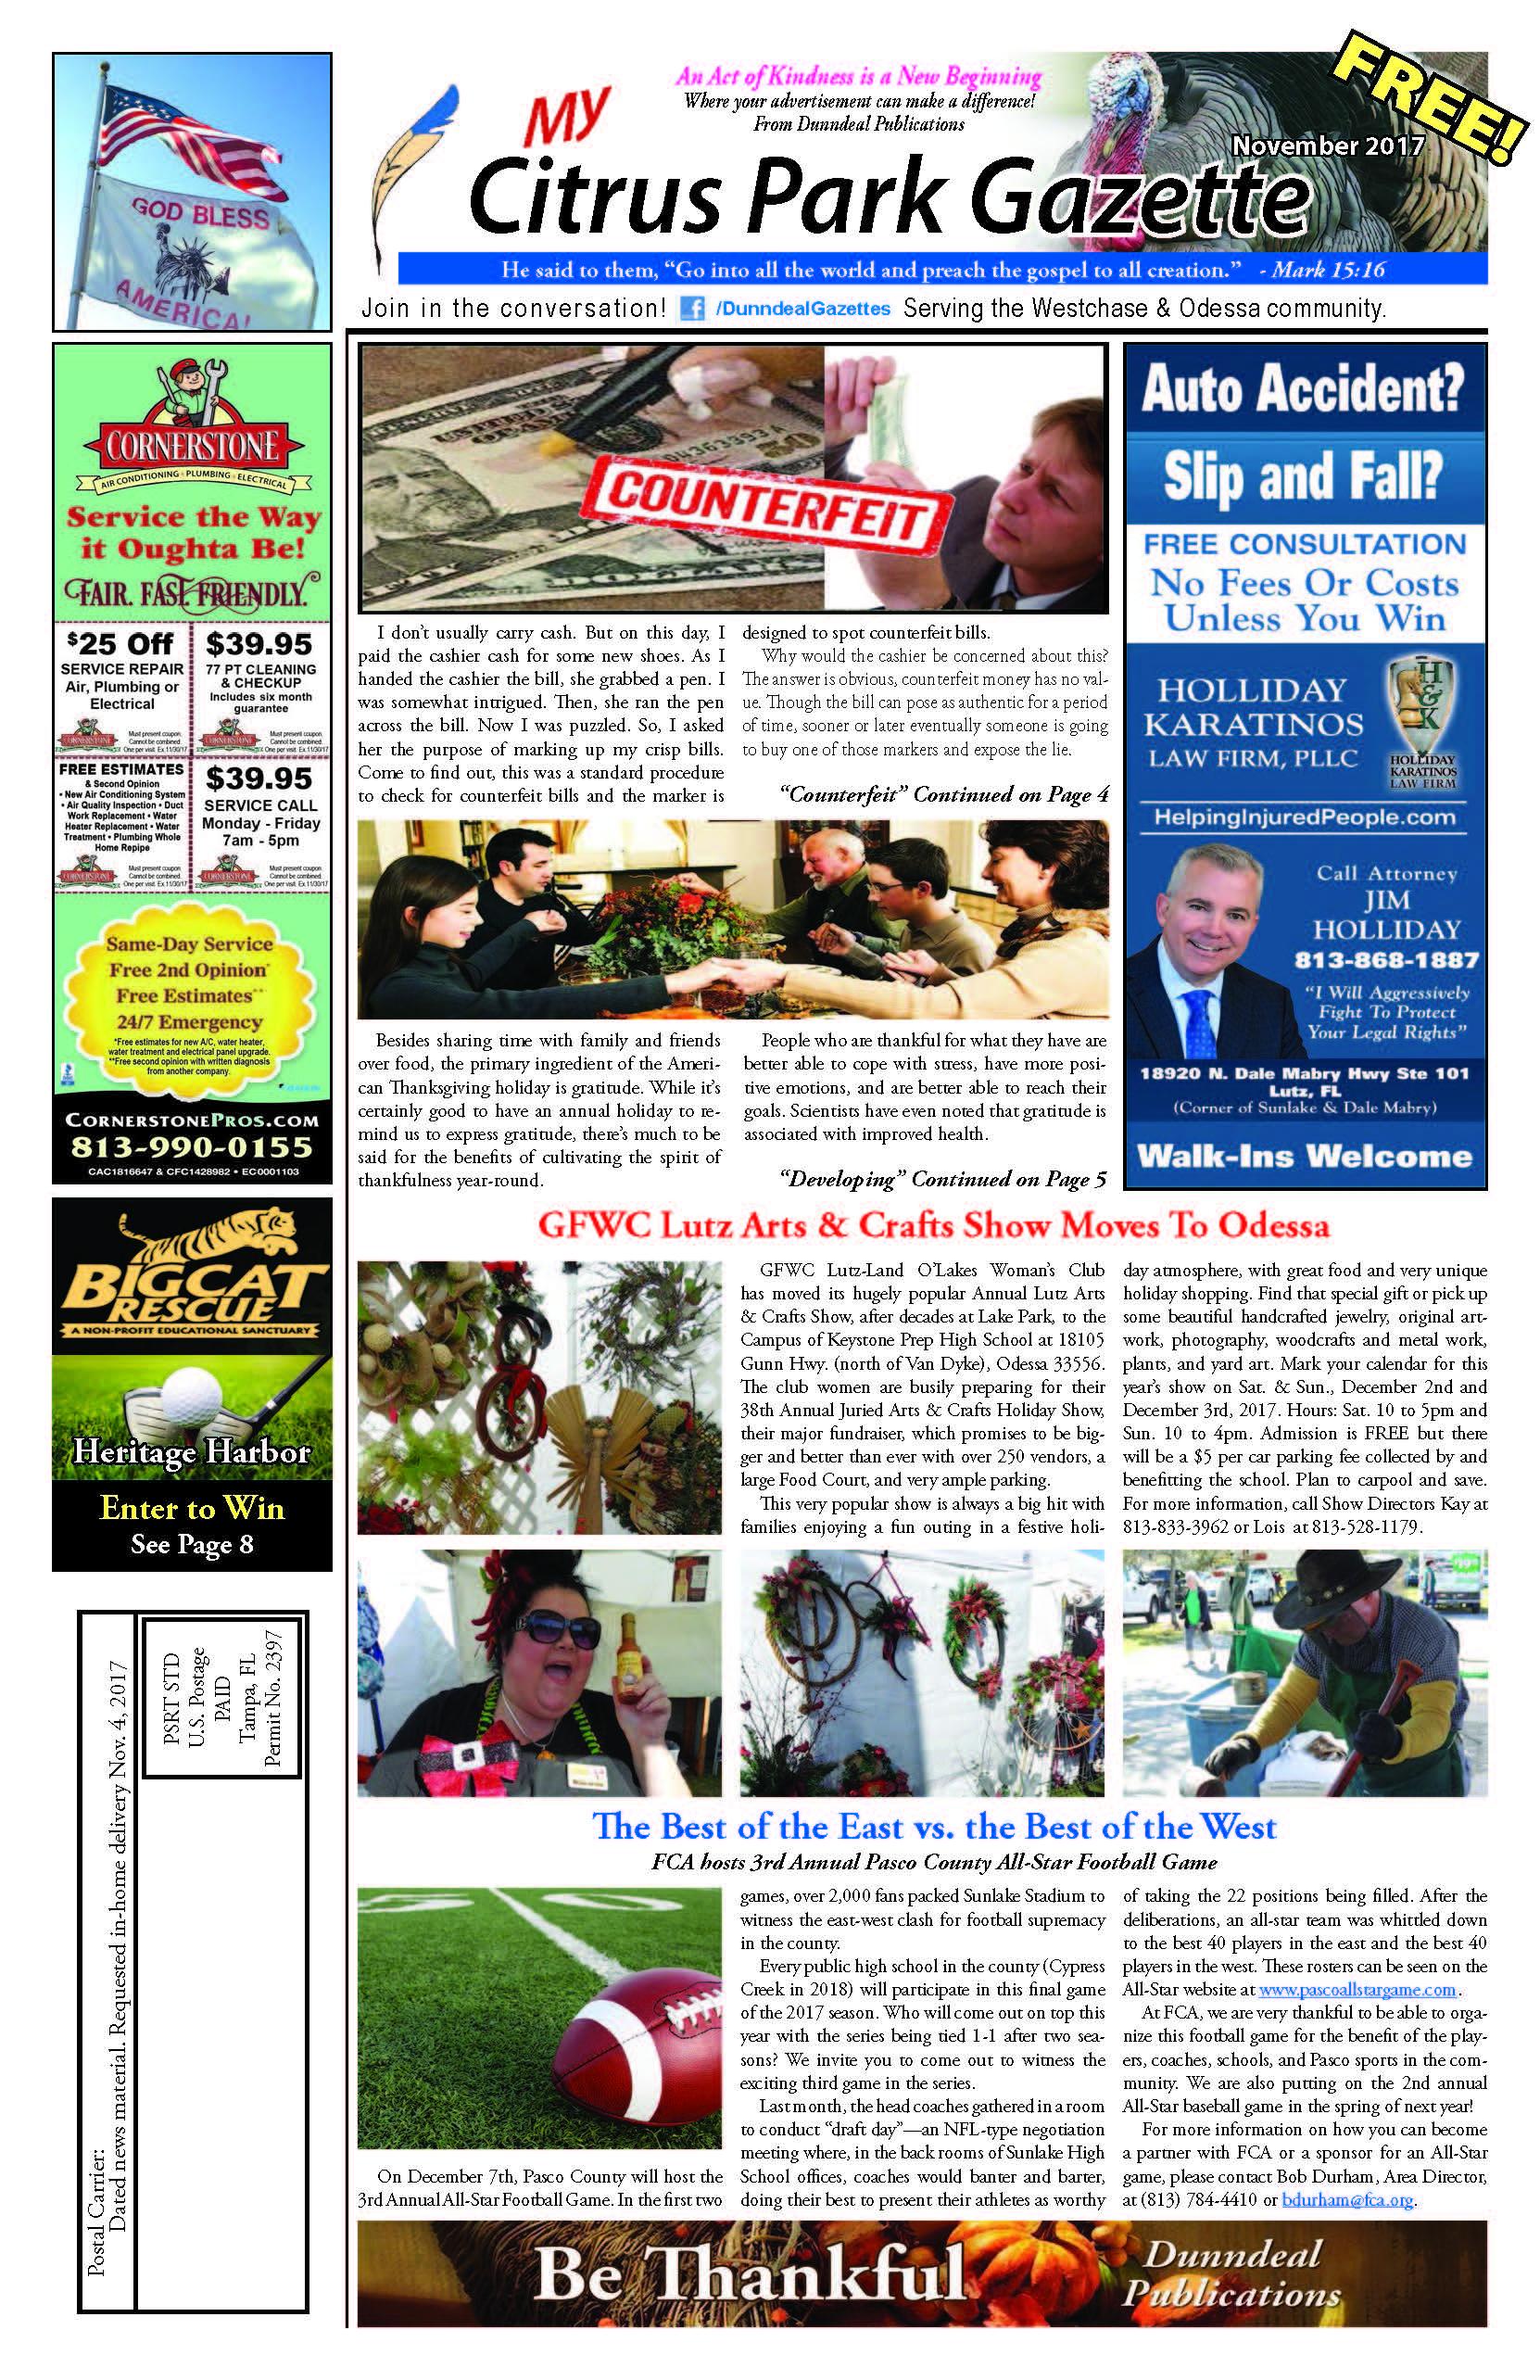 Citrus-Park-Gazette-November-2017-Page_01.jpg